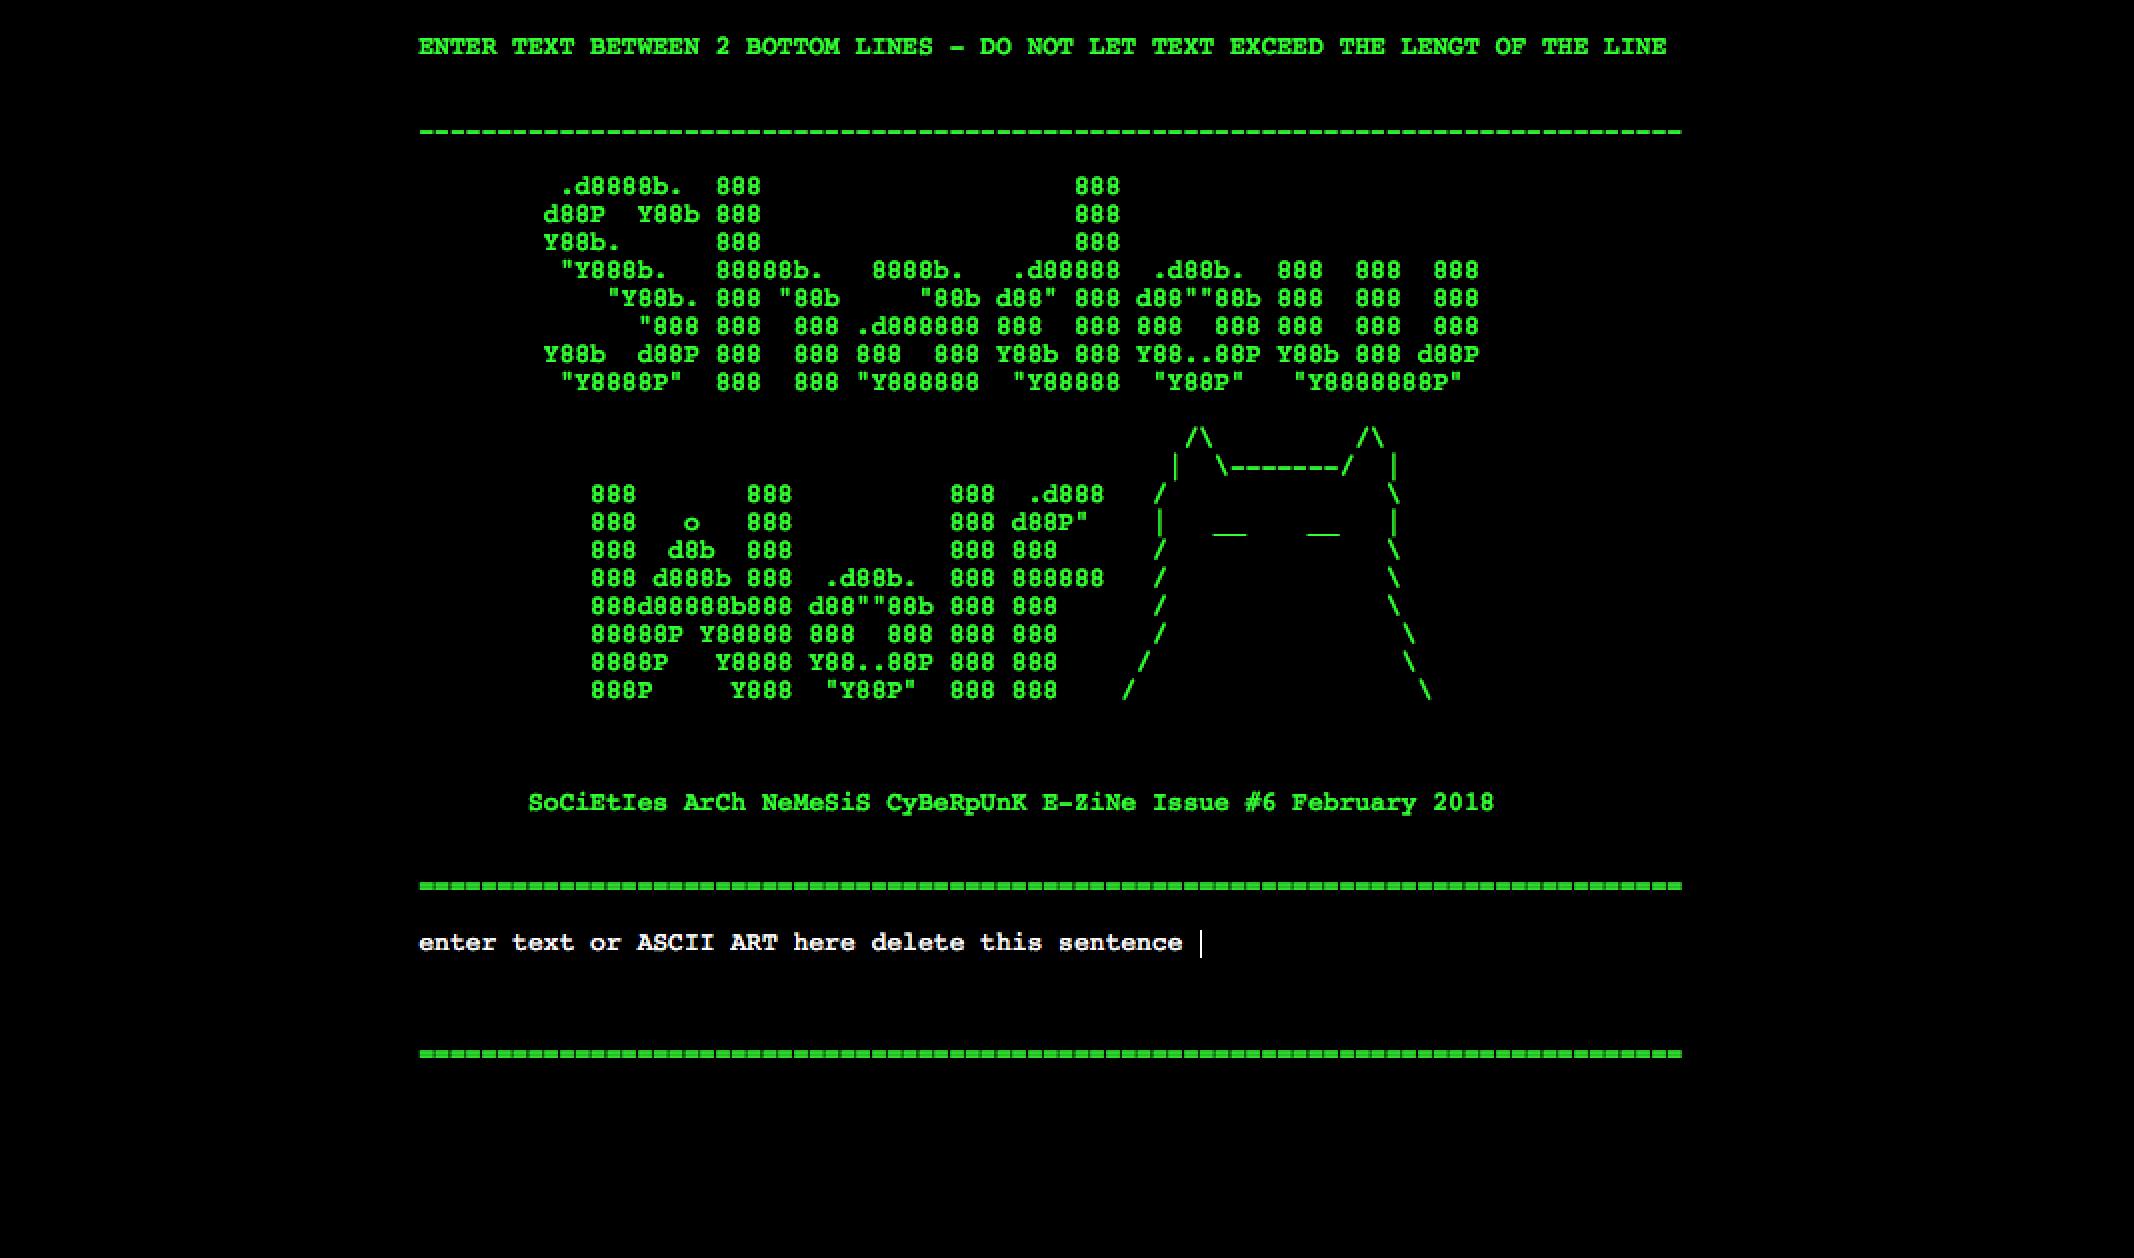 Shadow Wolf Cyberzine Workshop Seminar